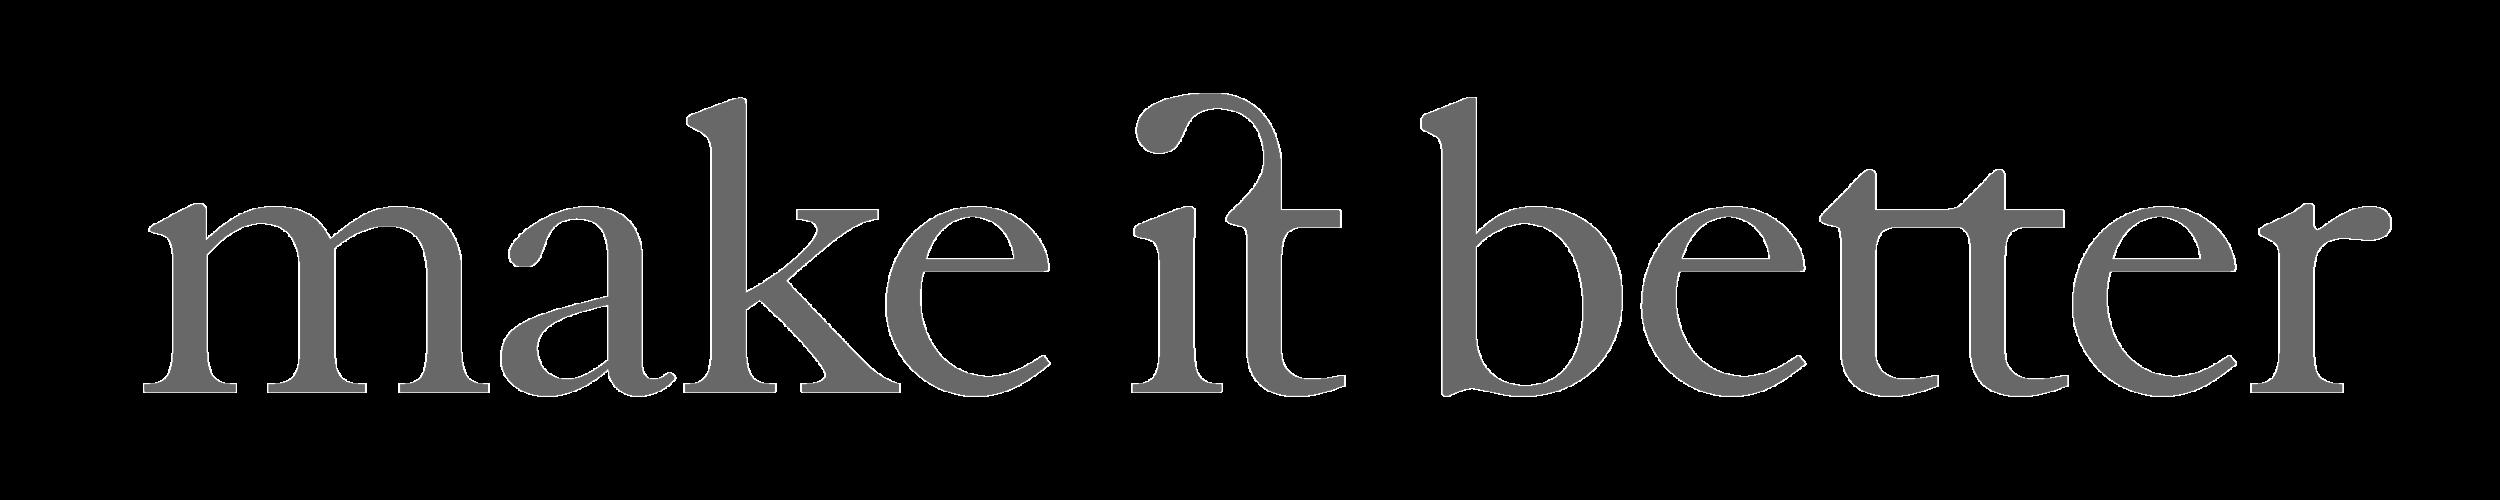 Make-It-Better-Logo-copy.png